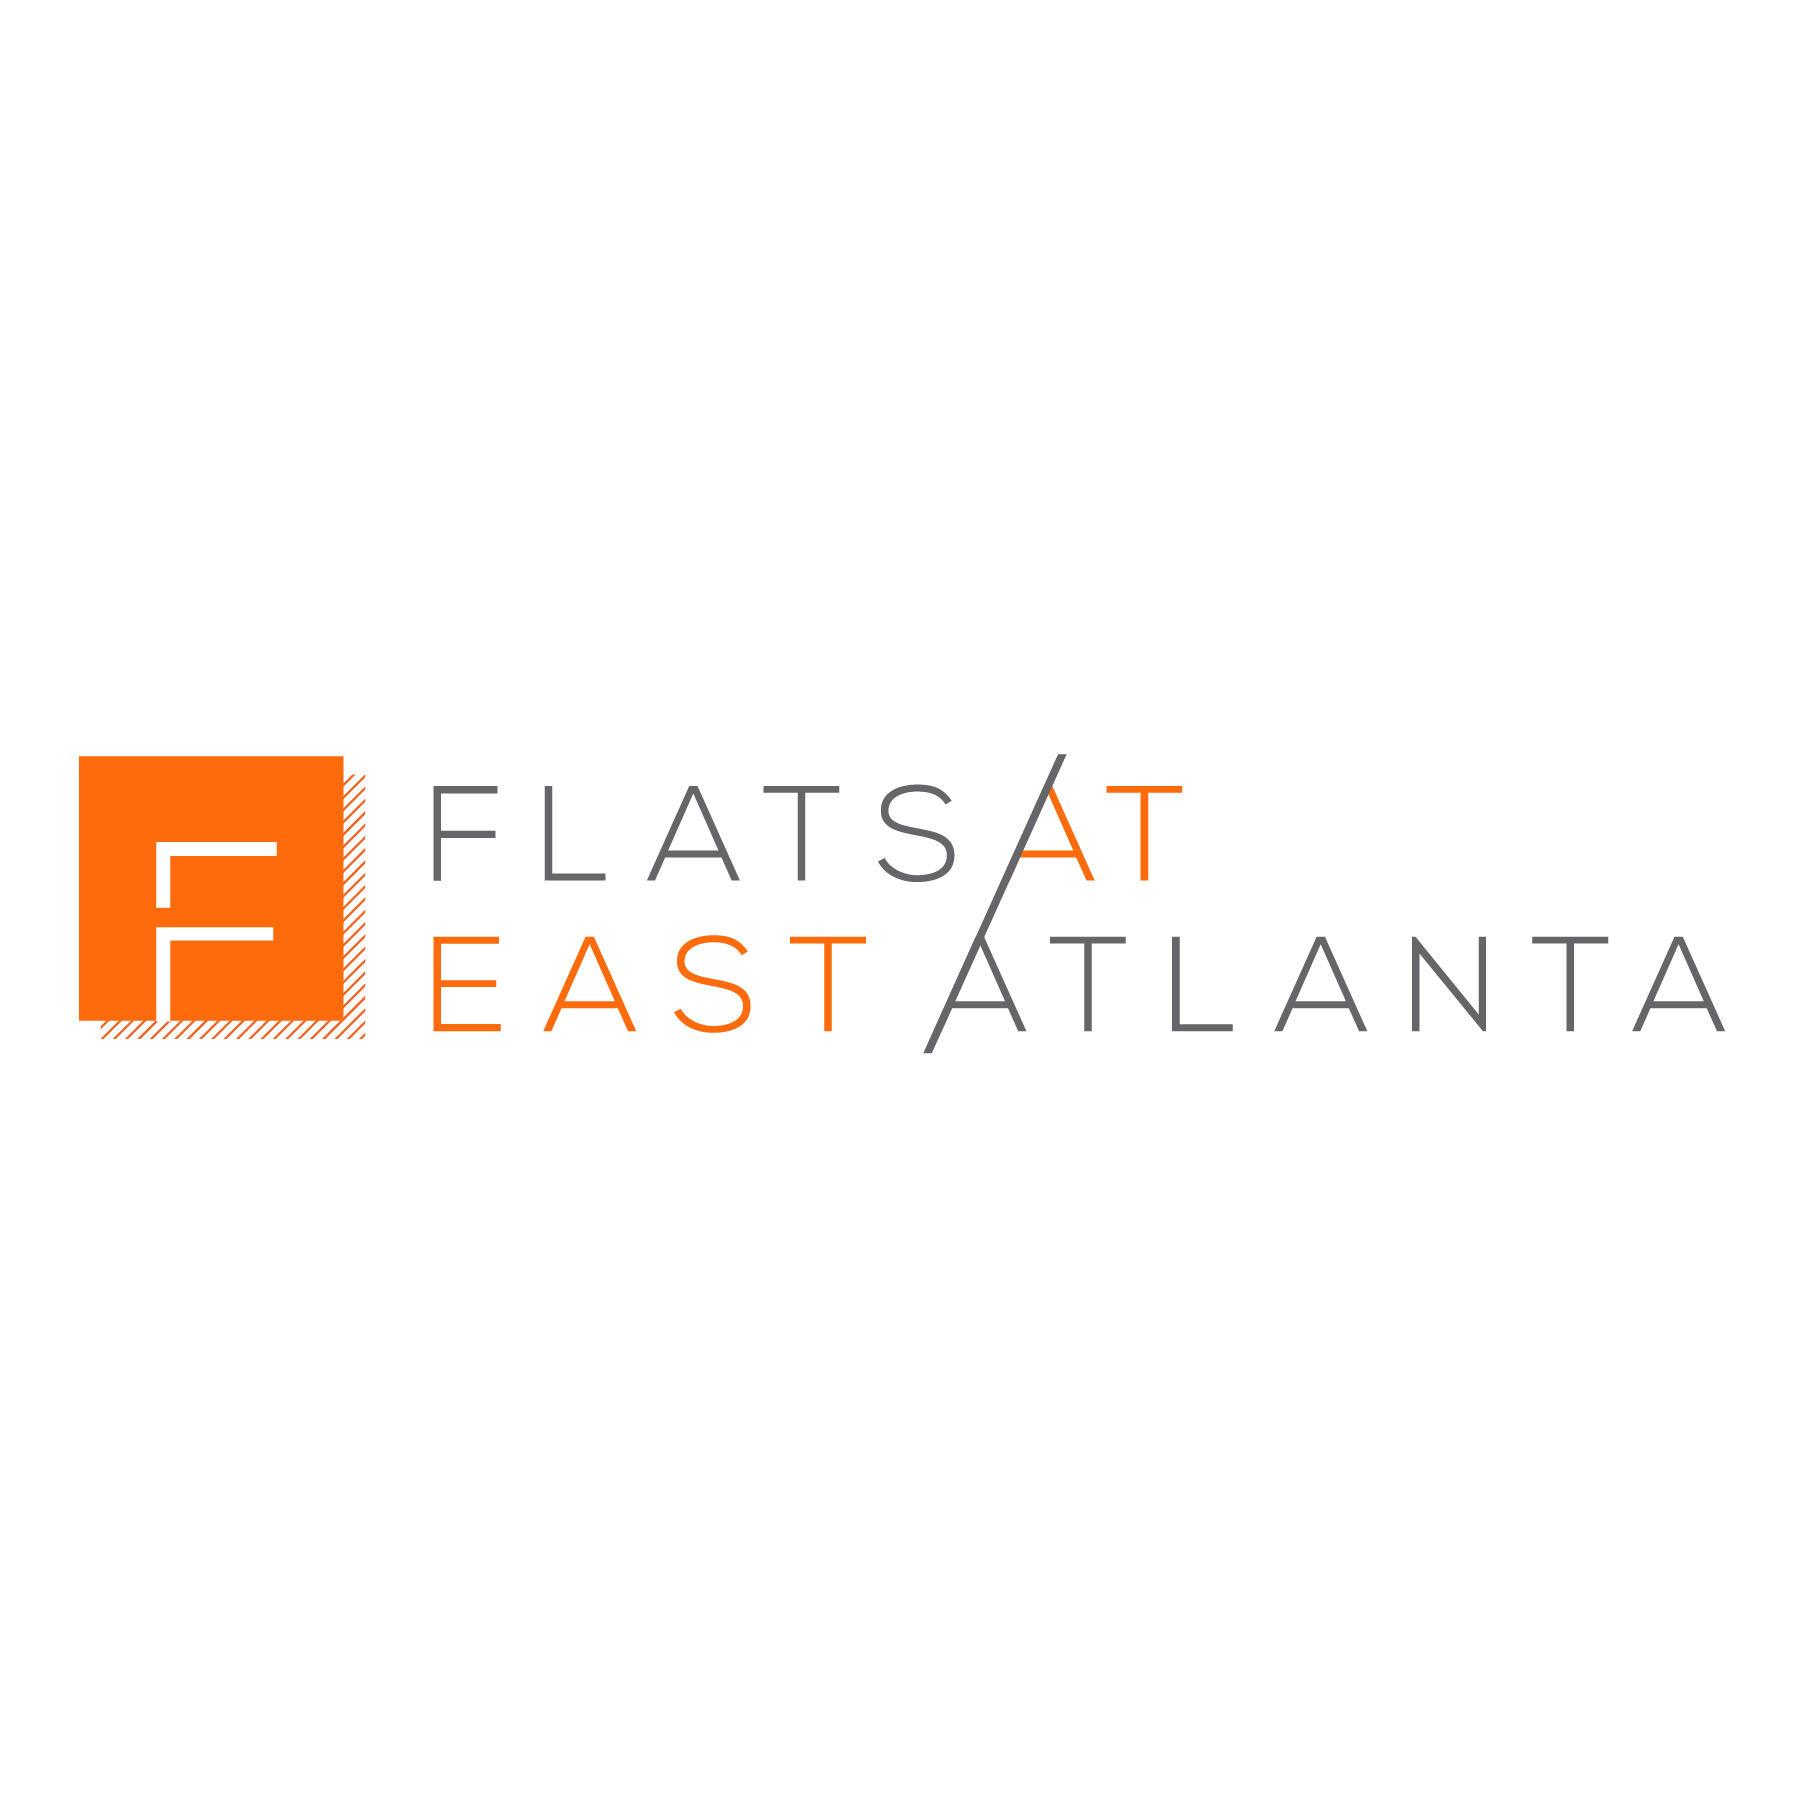 Flats at East Atlanta